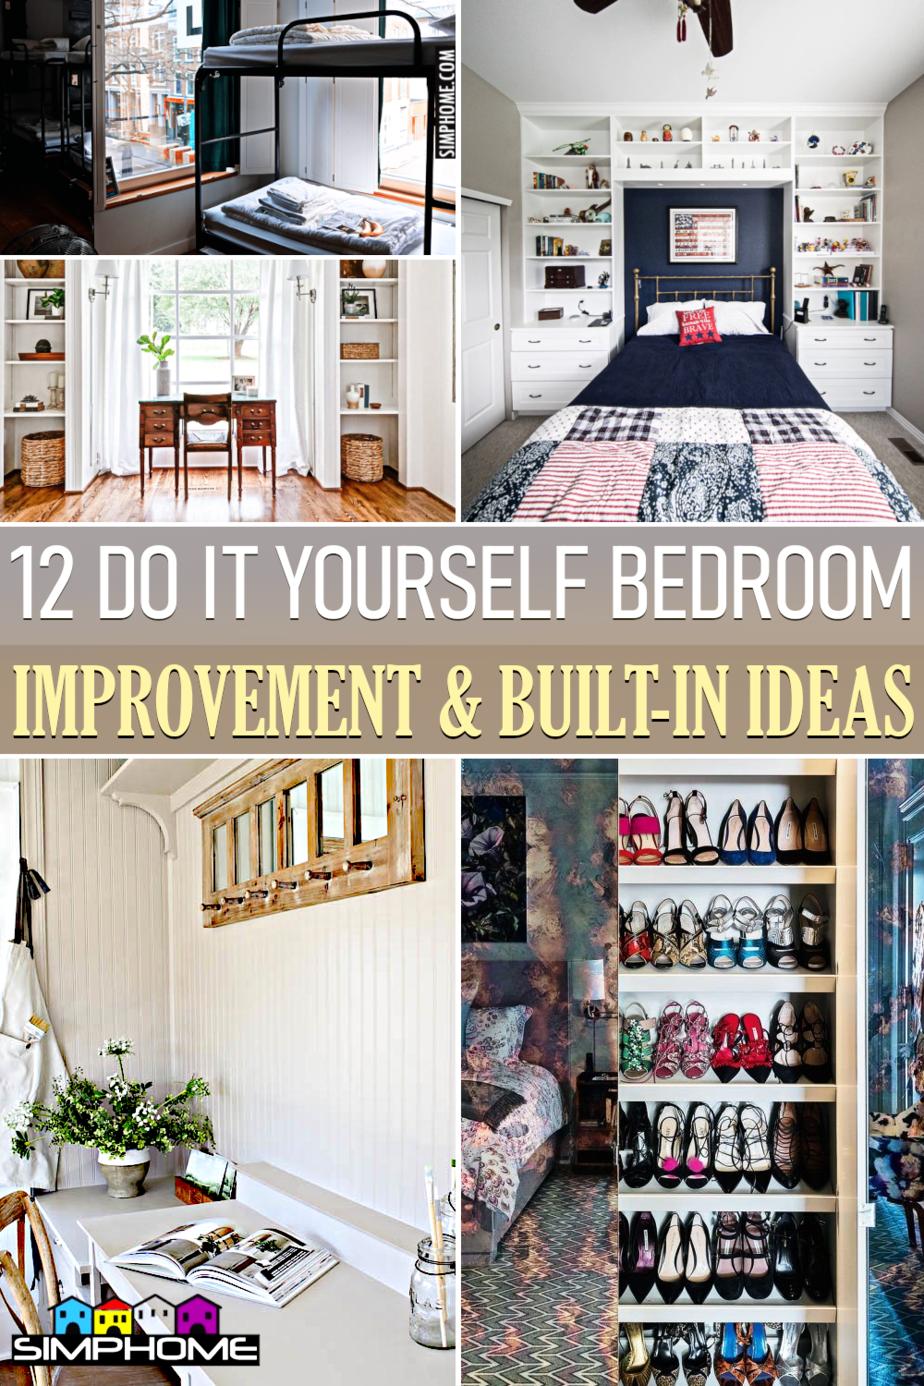 12 Bedroom Built in Ideas via Simphome.comFeatured